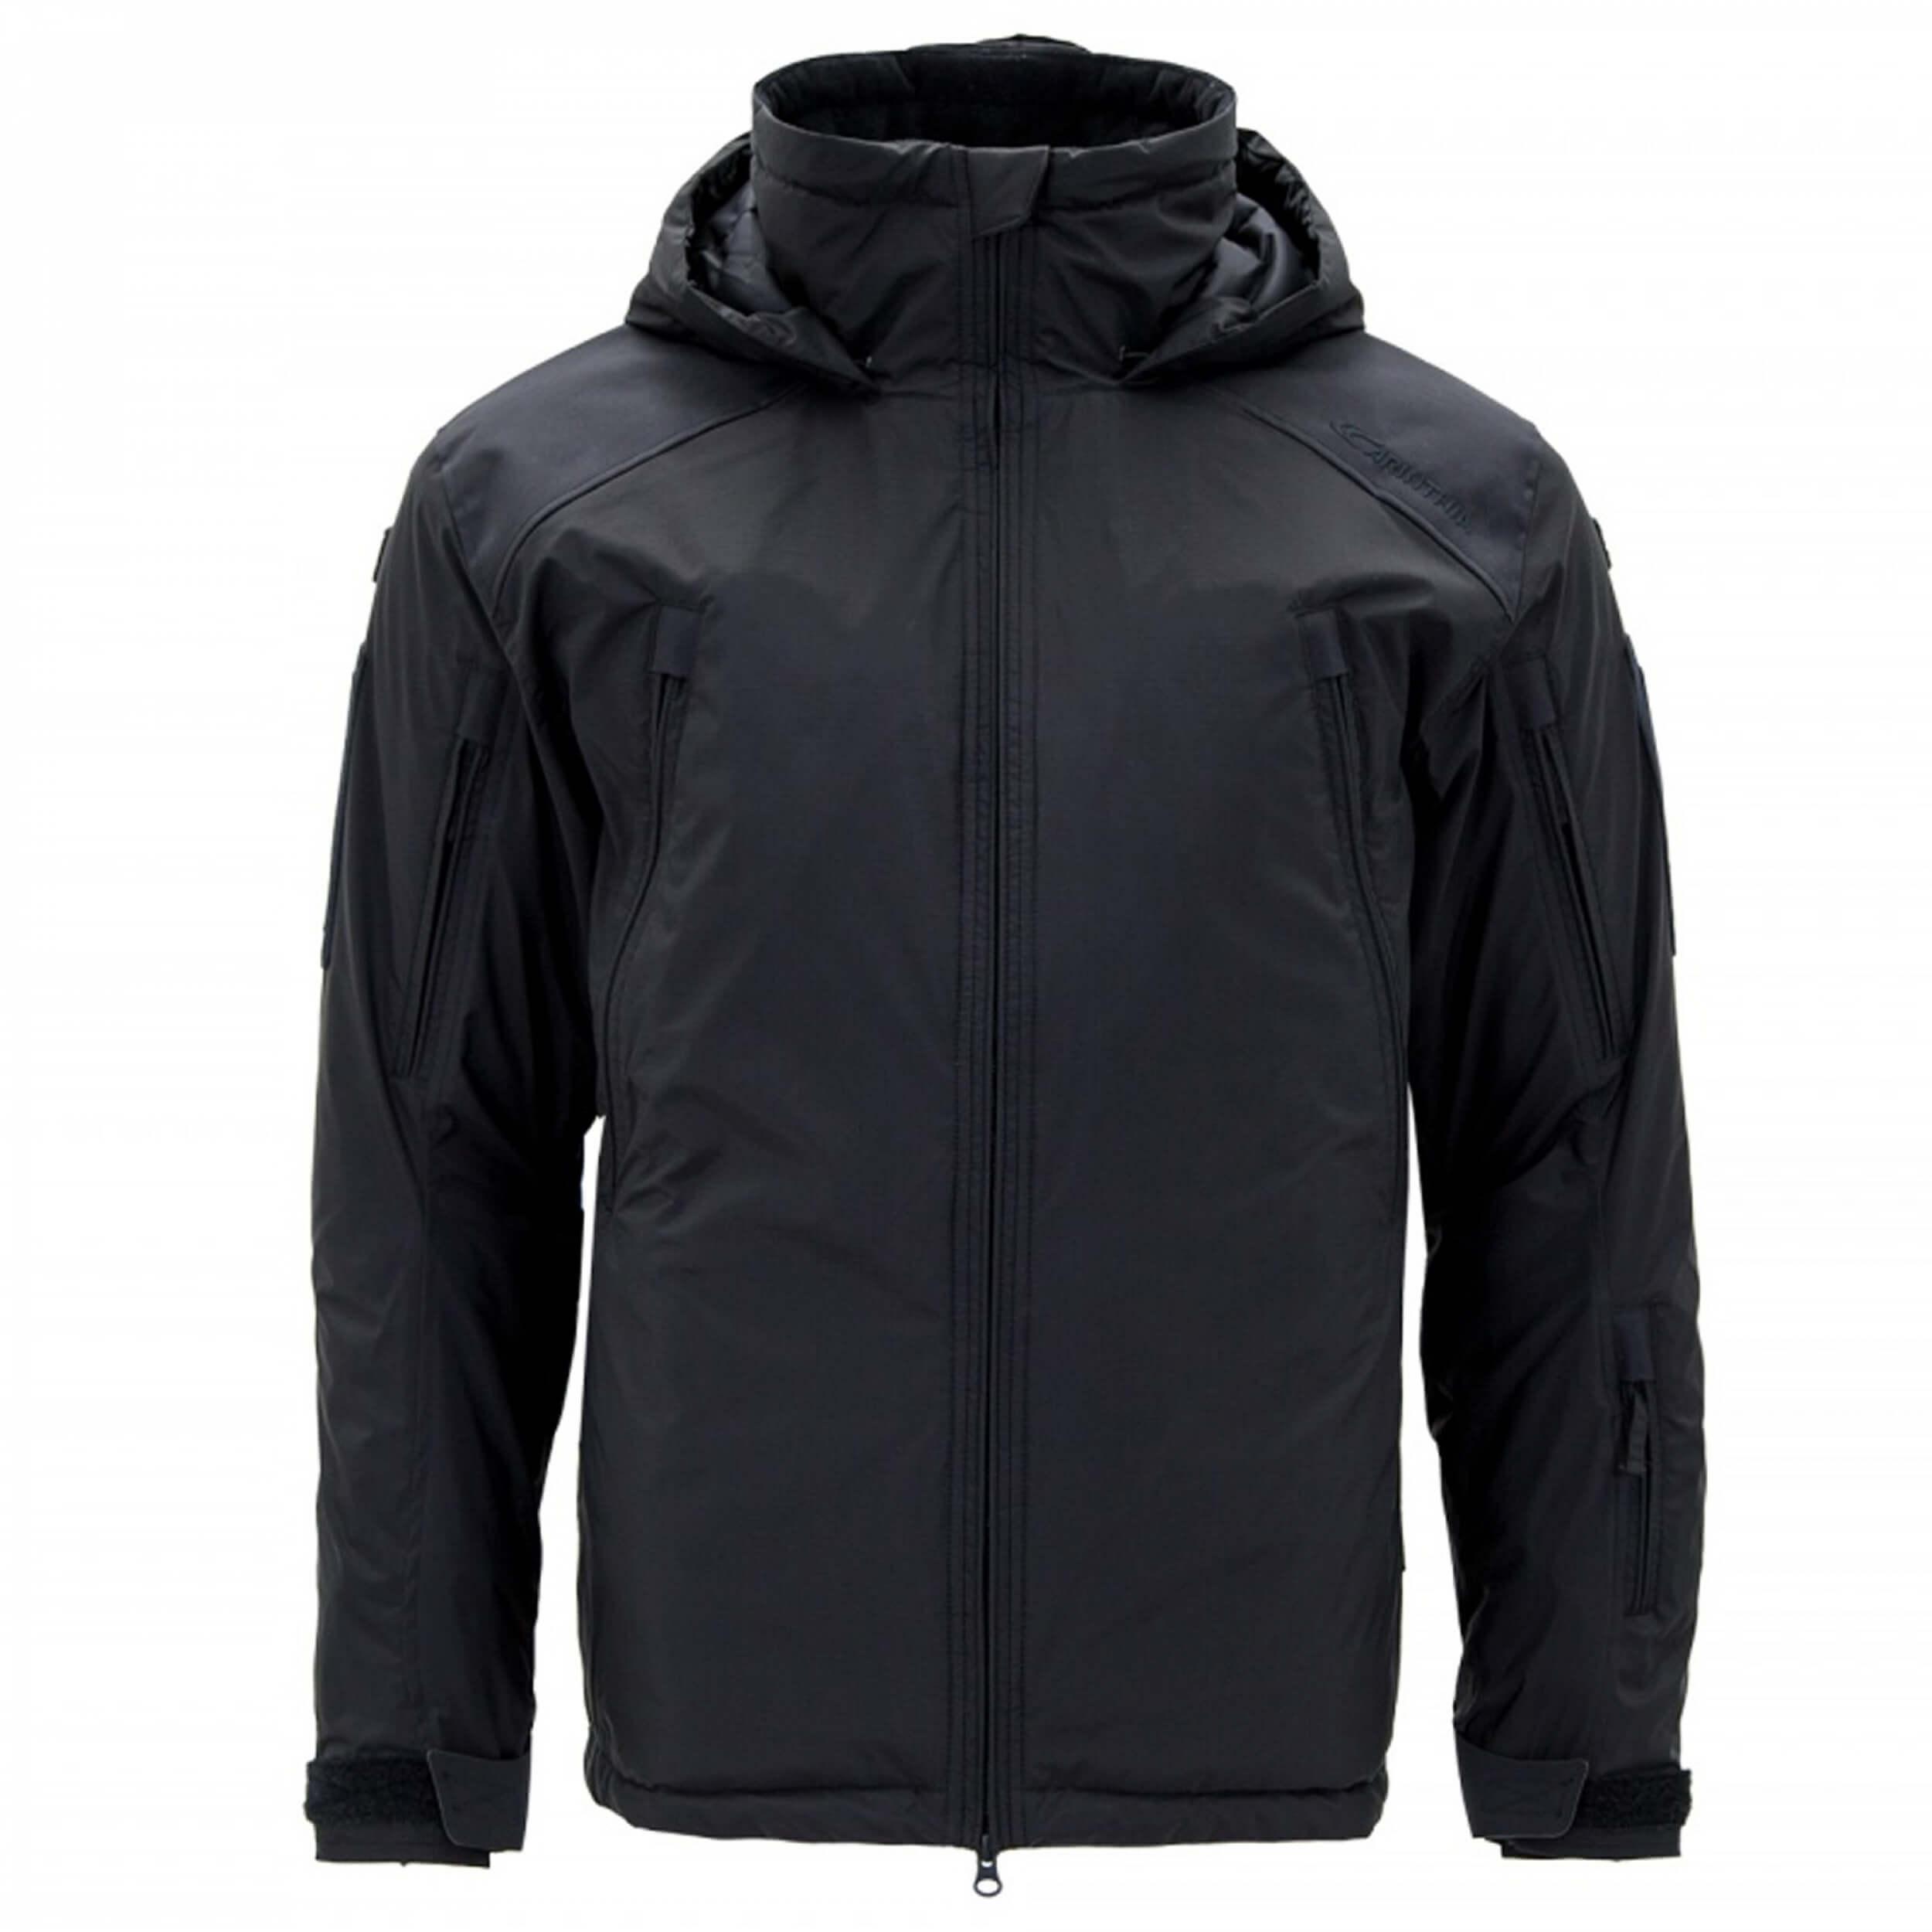 Carinthia MIG 4.0 Jacke schwarz